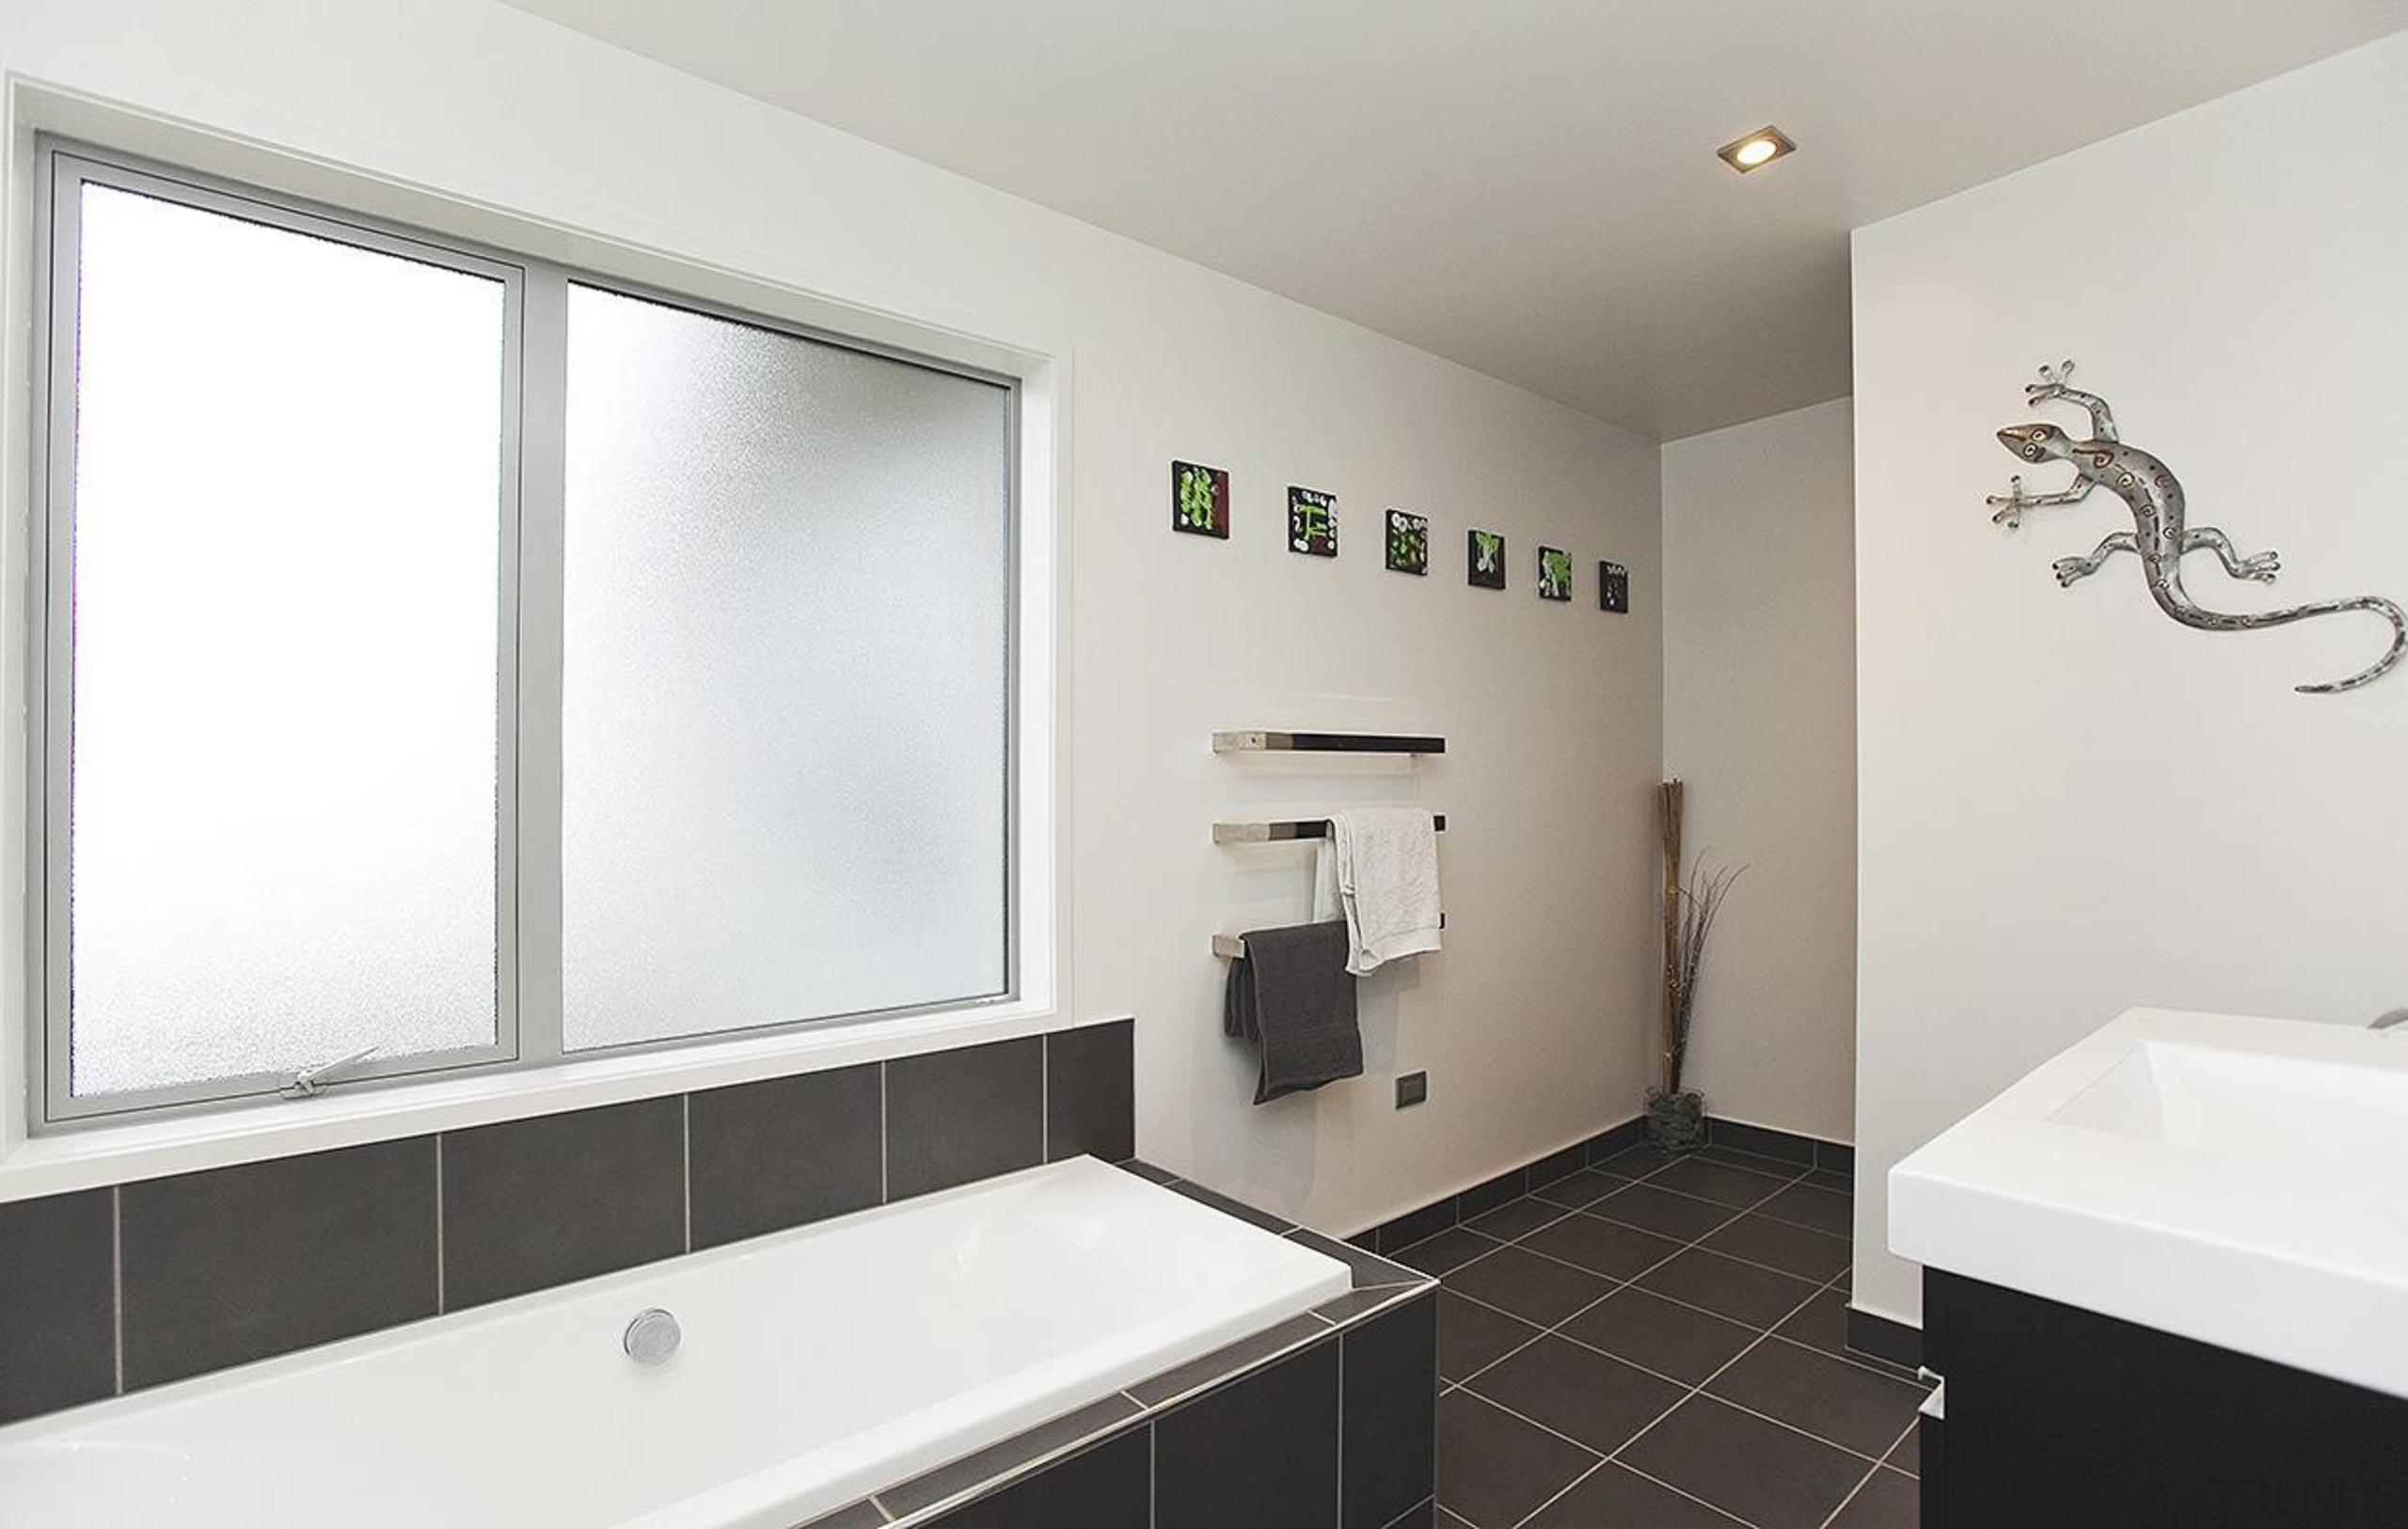 For more information, please visit www.gjgardner.co.nz bathroom, floor, home, interior design, property, real estate, room, window, white